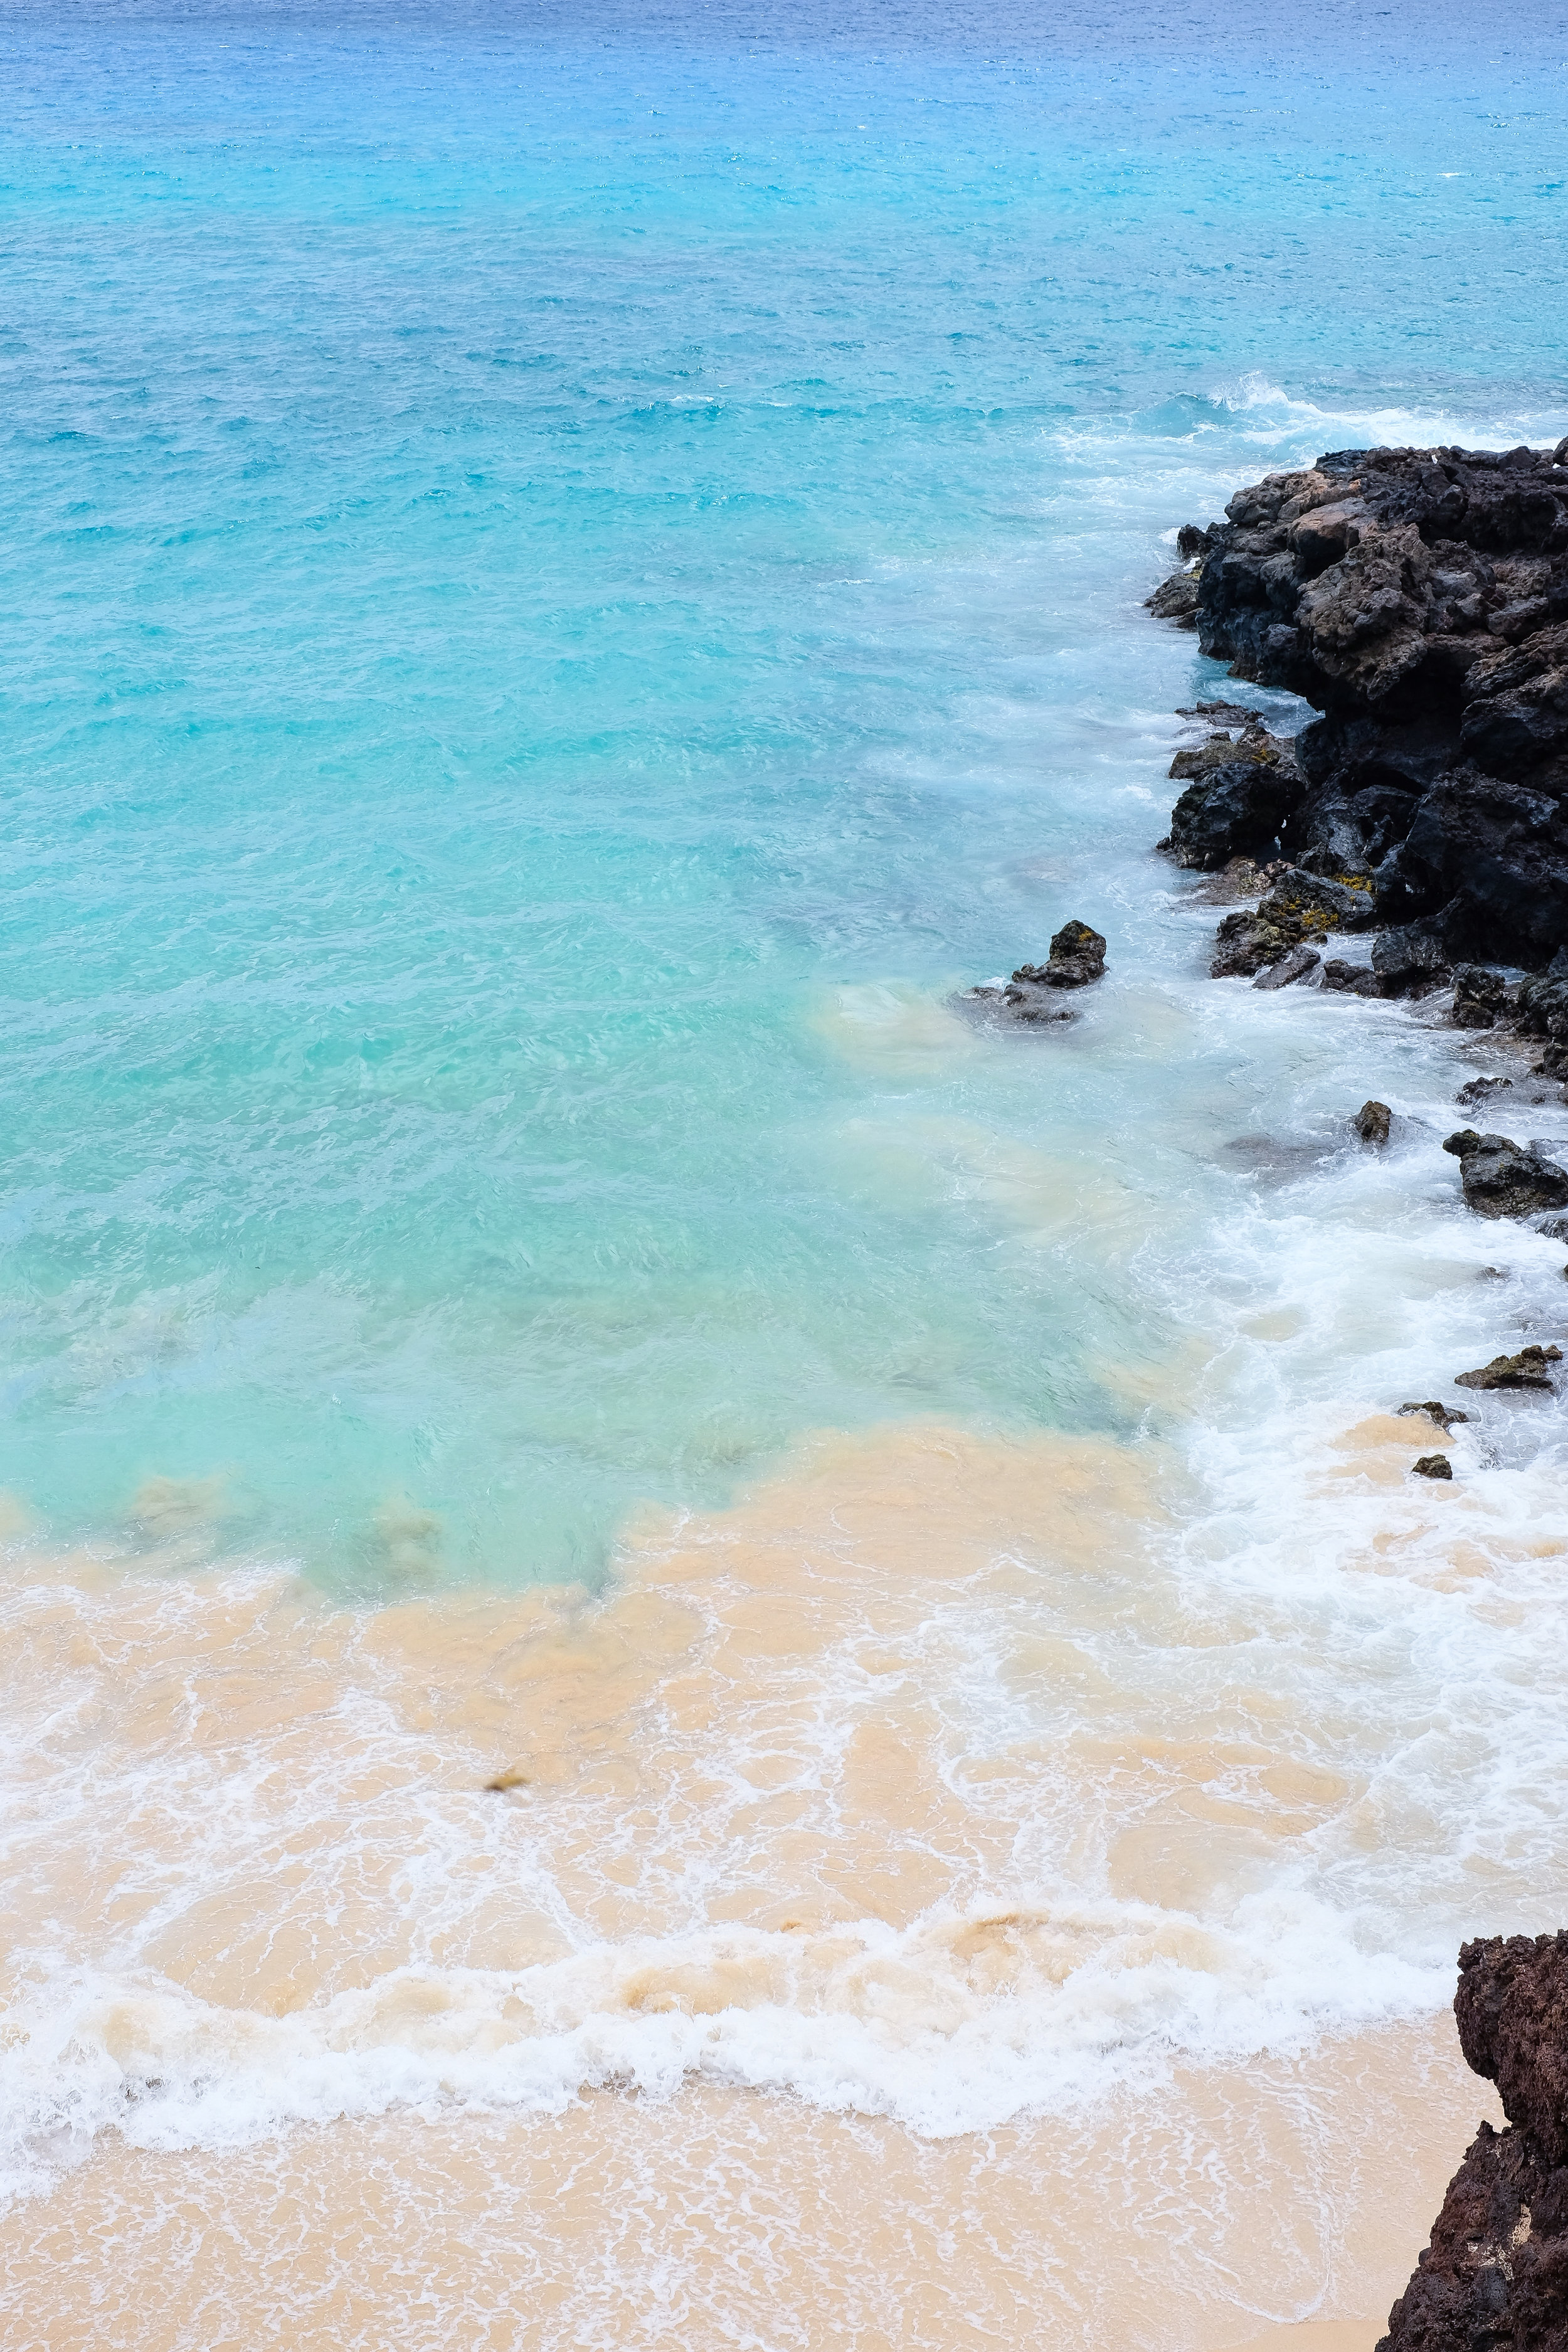 Maui-AquaAgua.jpg